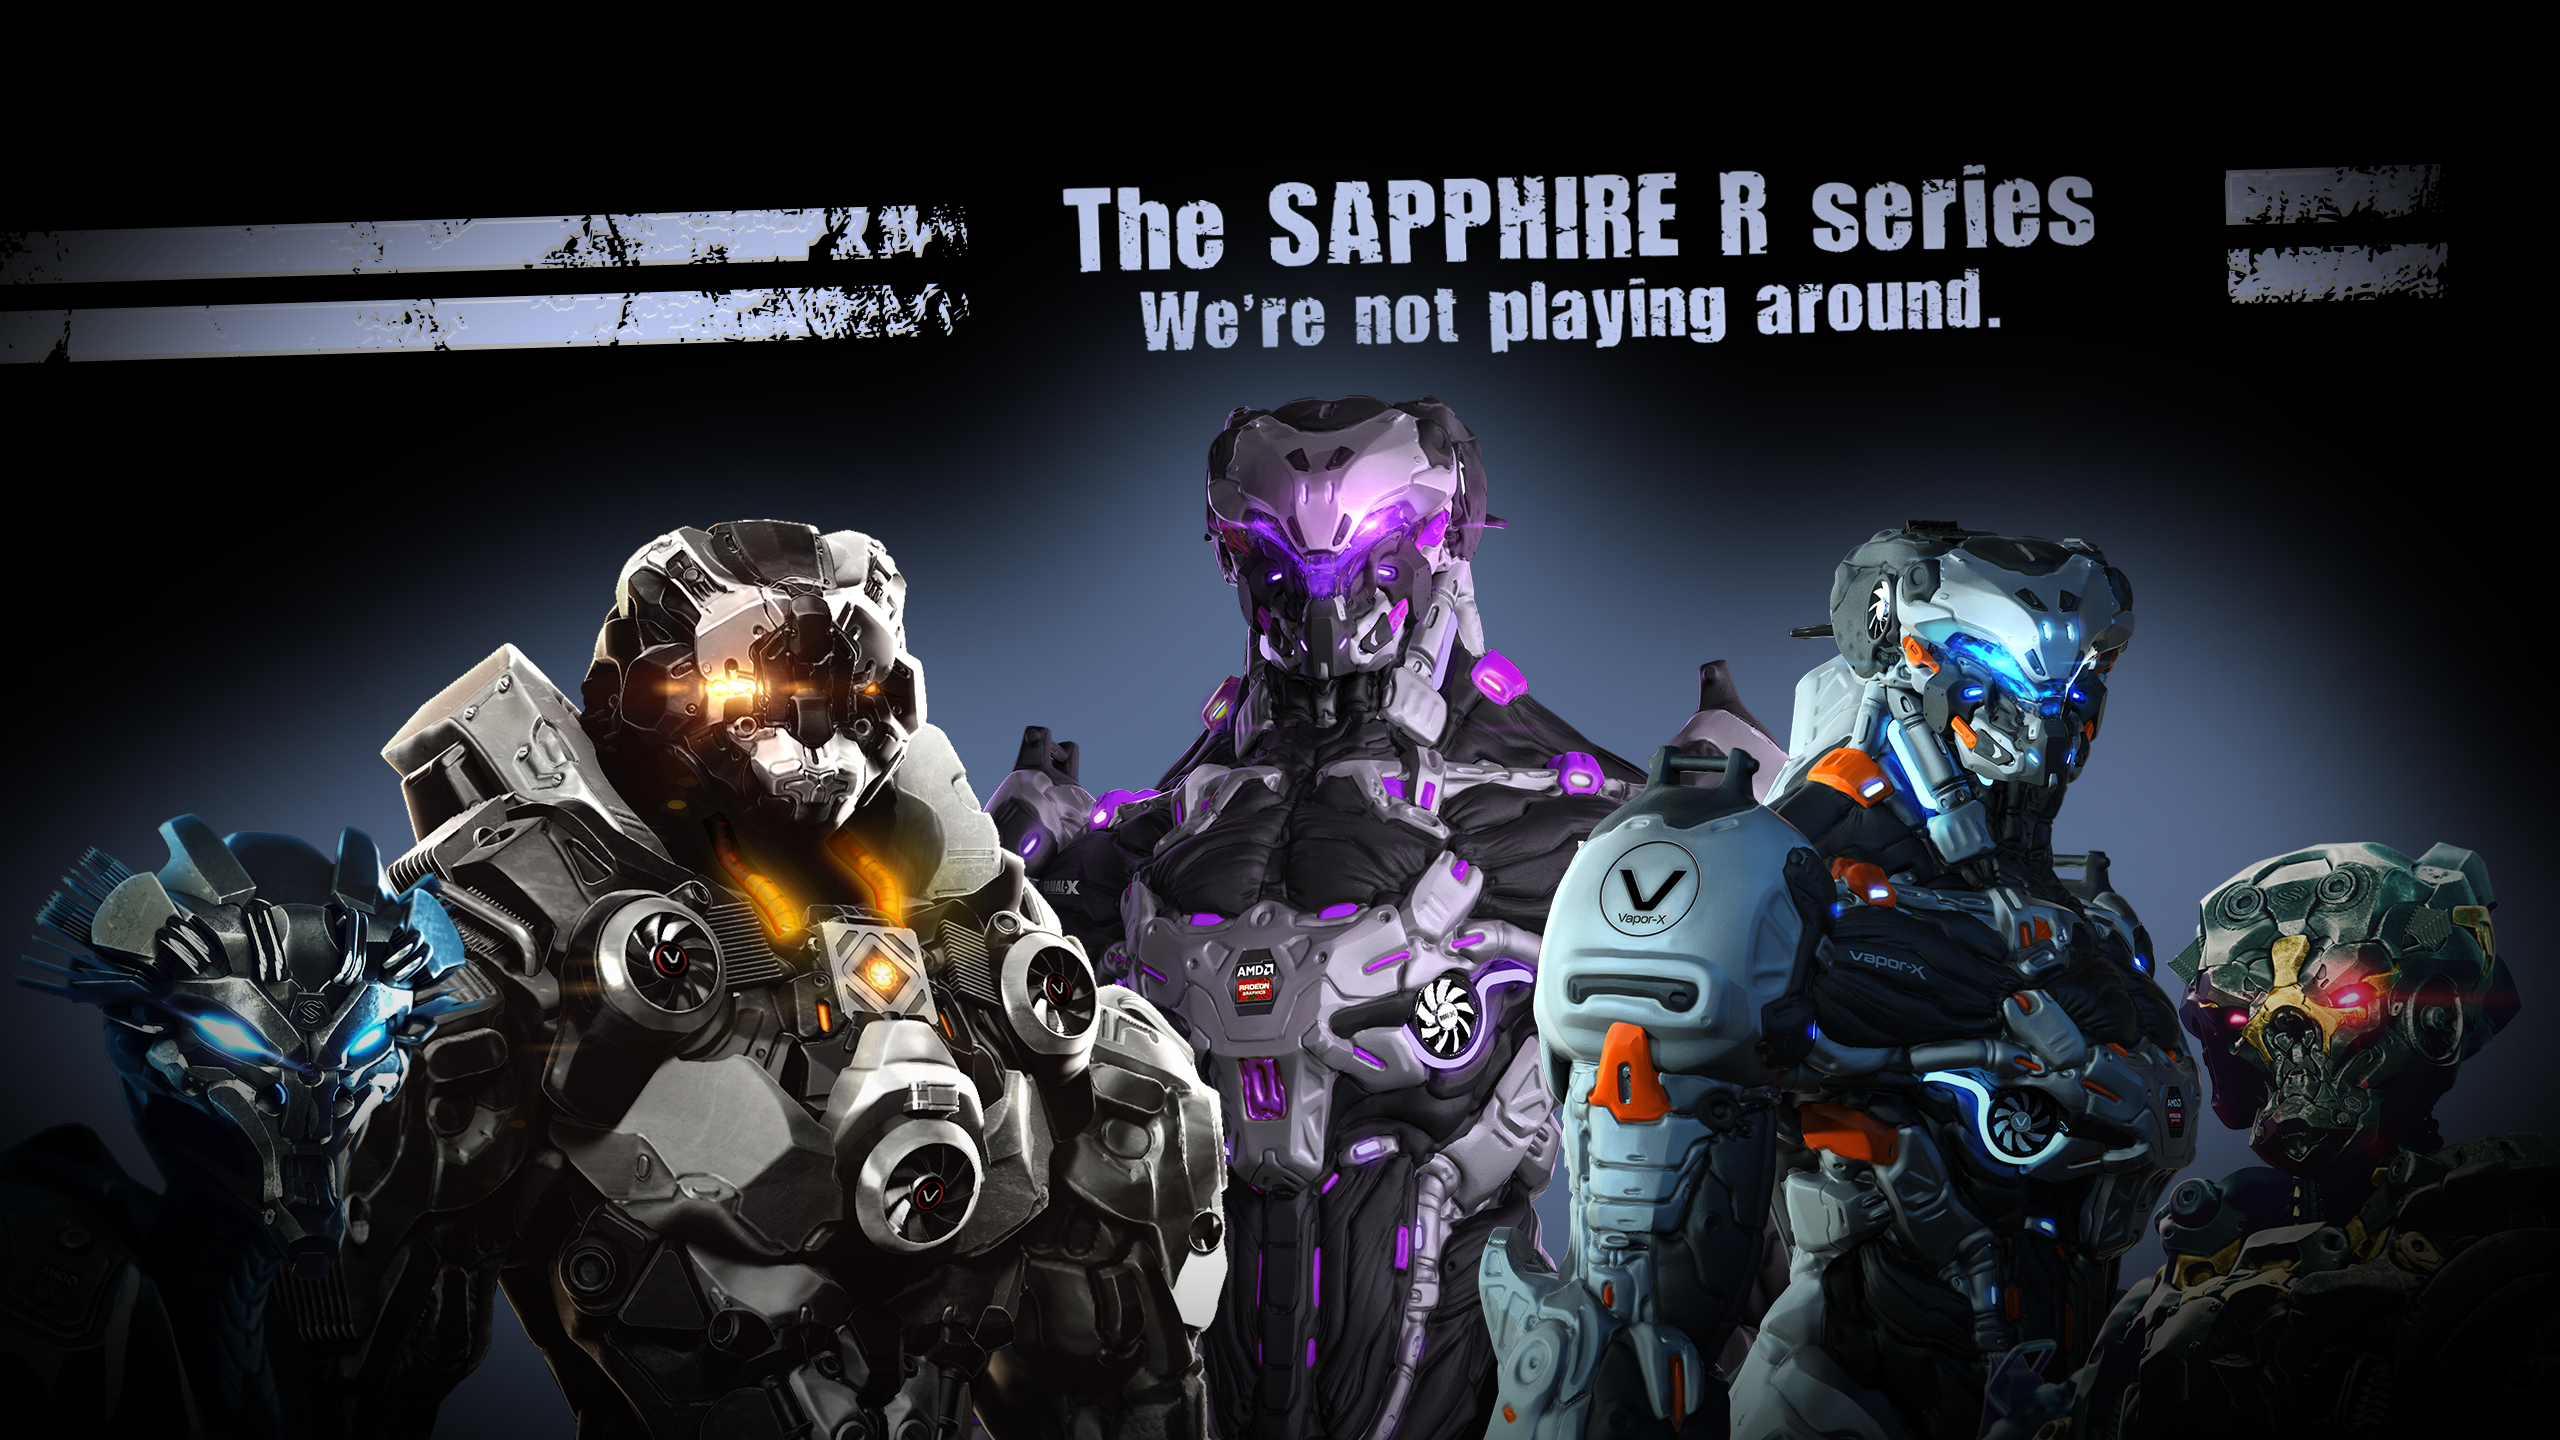 VAPOR X More Poisons From Sapphire   wwwhardwarezonecomsg 2560x1440